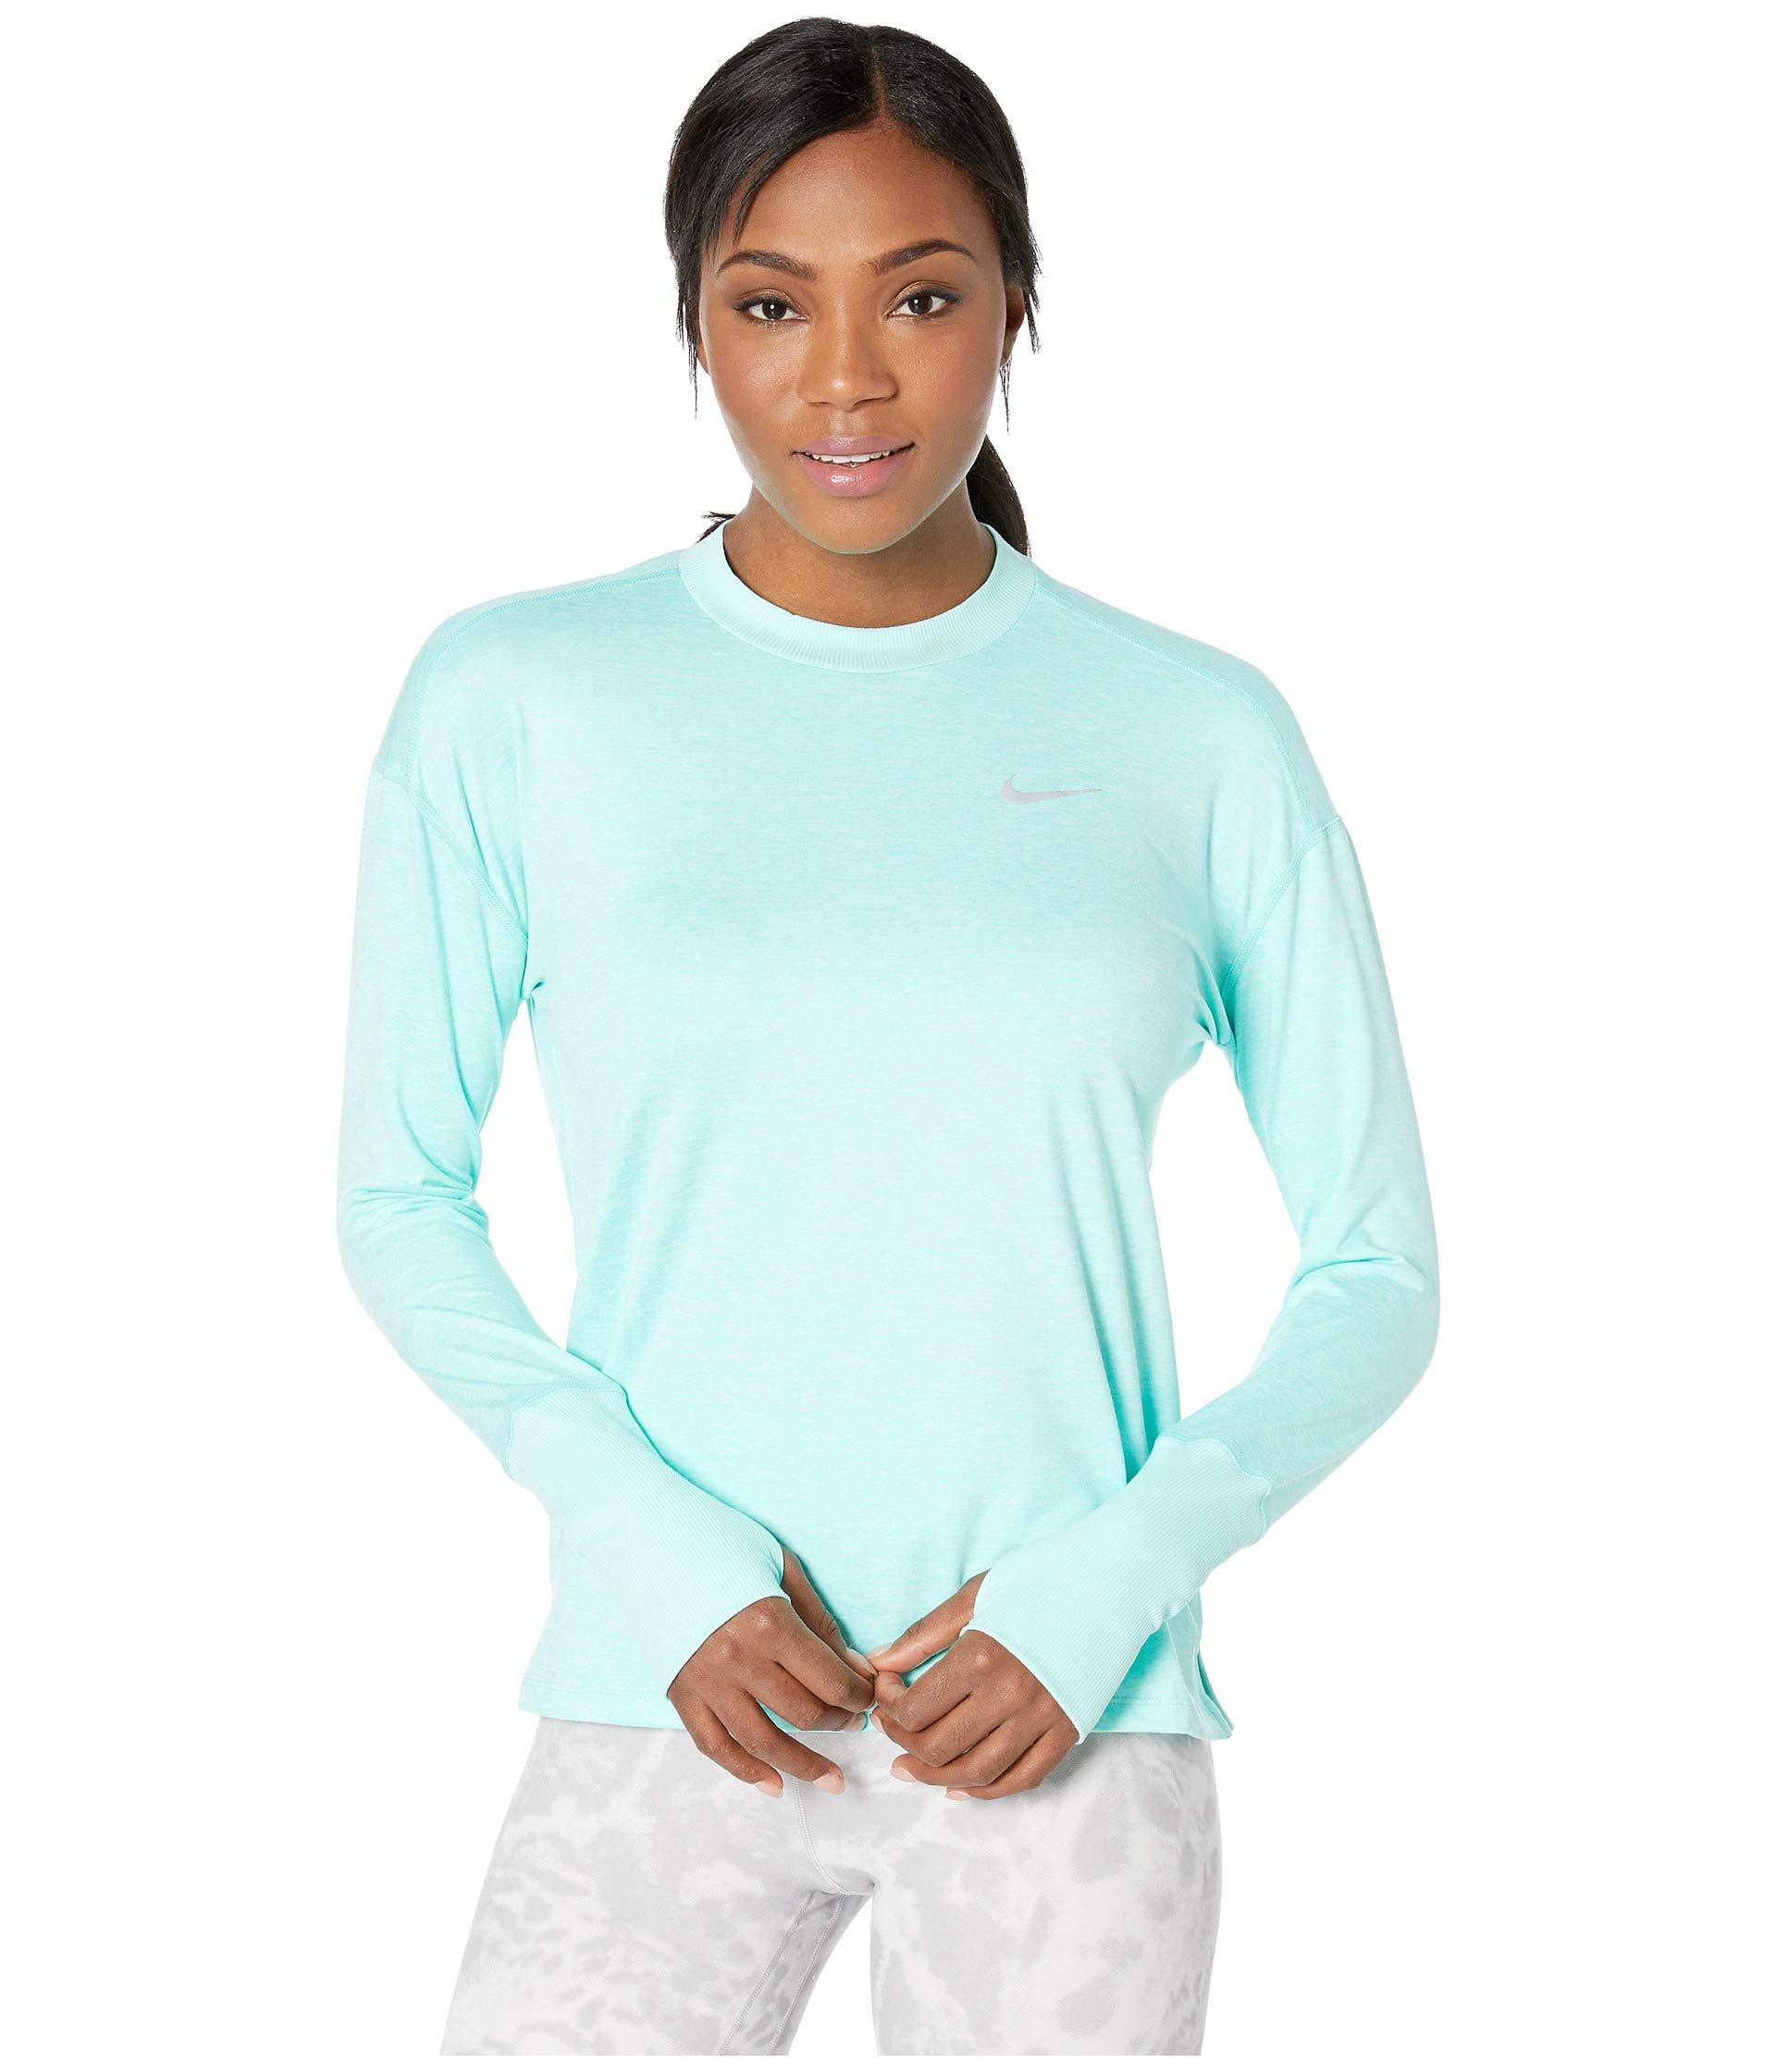 Nike Women's Element Long Sleeve Running Shirt (Tropical Twist/Teal Tint, X-Small)